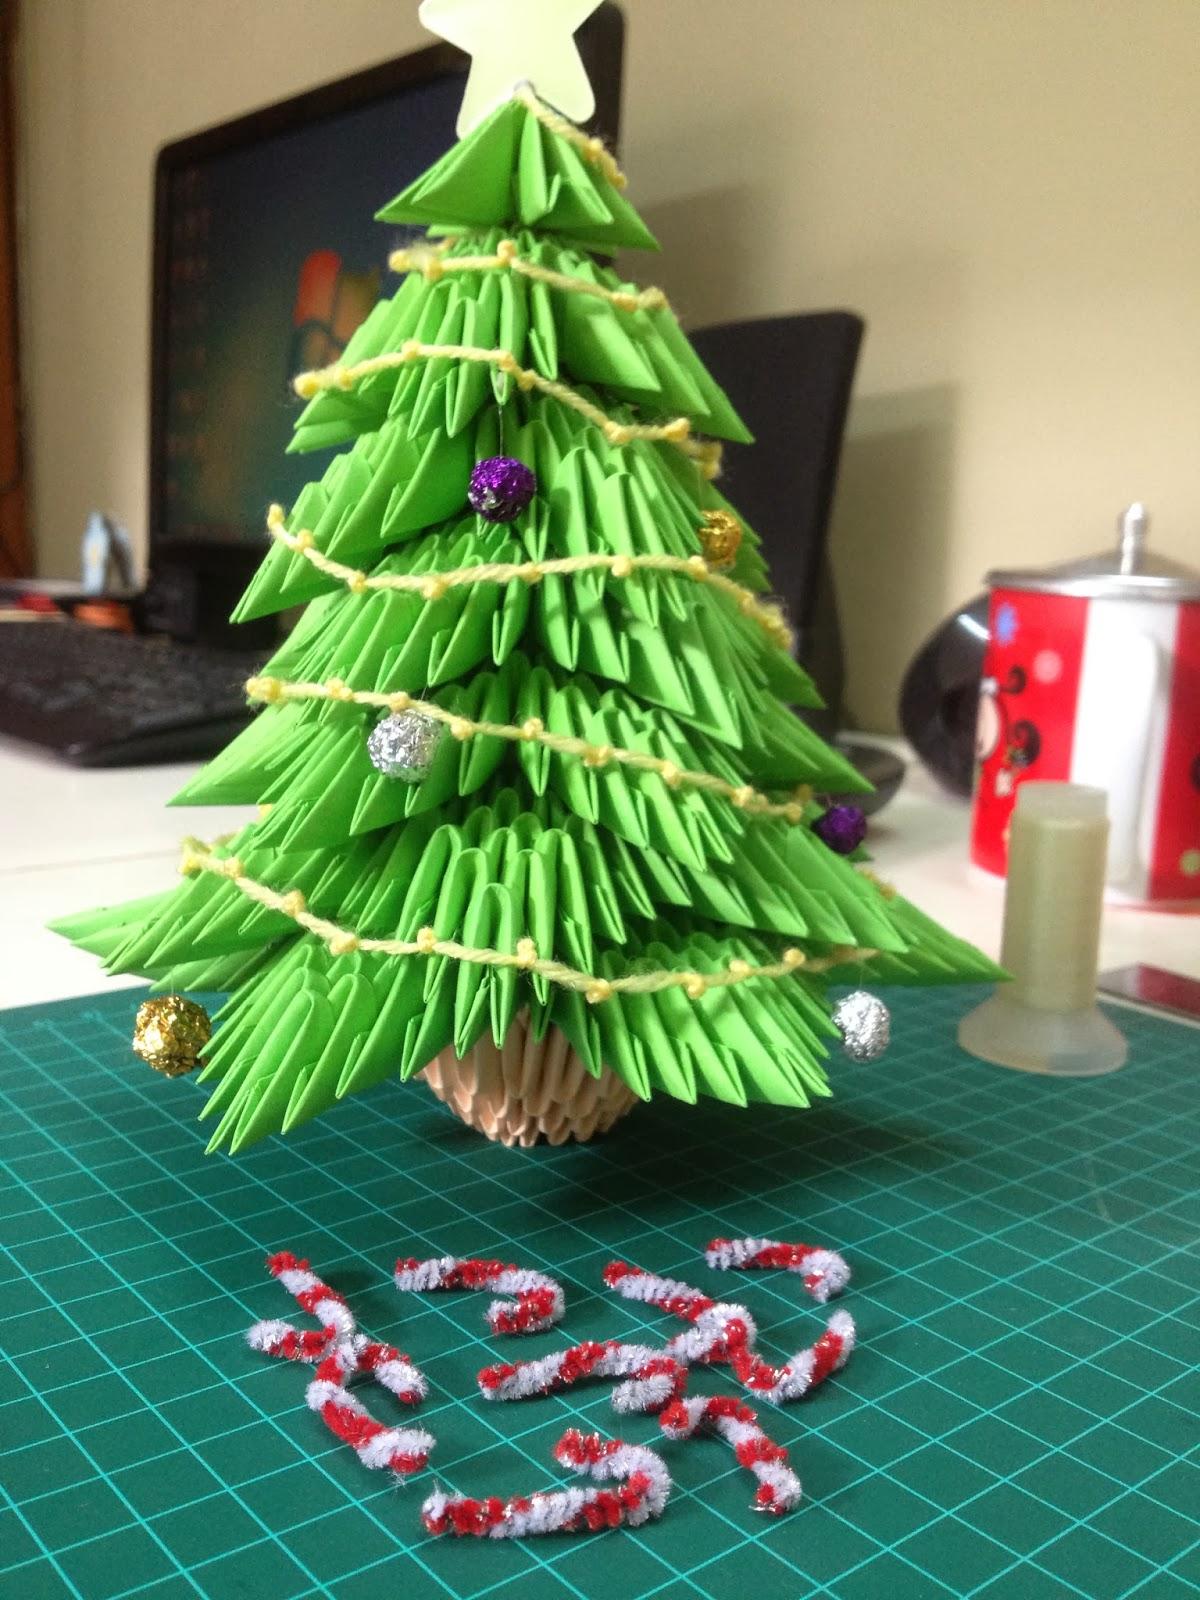 3d Origami Christmas Tree Diagram Electrical Wiring Pigorigami Pig Instructionsorigami Diagram3d Smallminitiny Oh Sheep